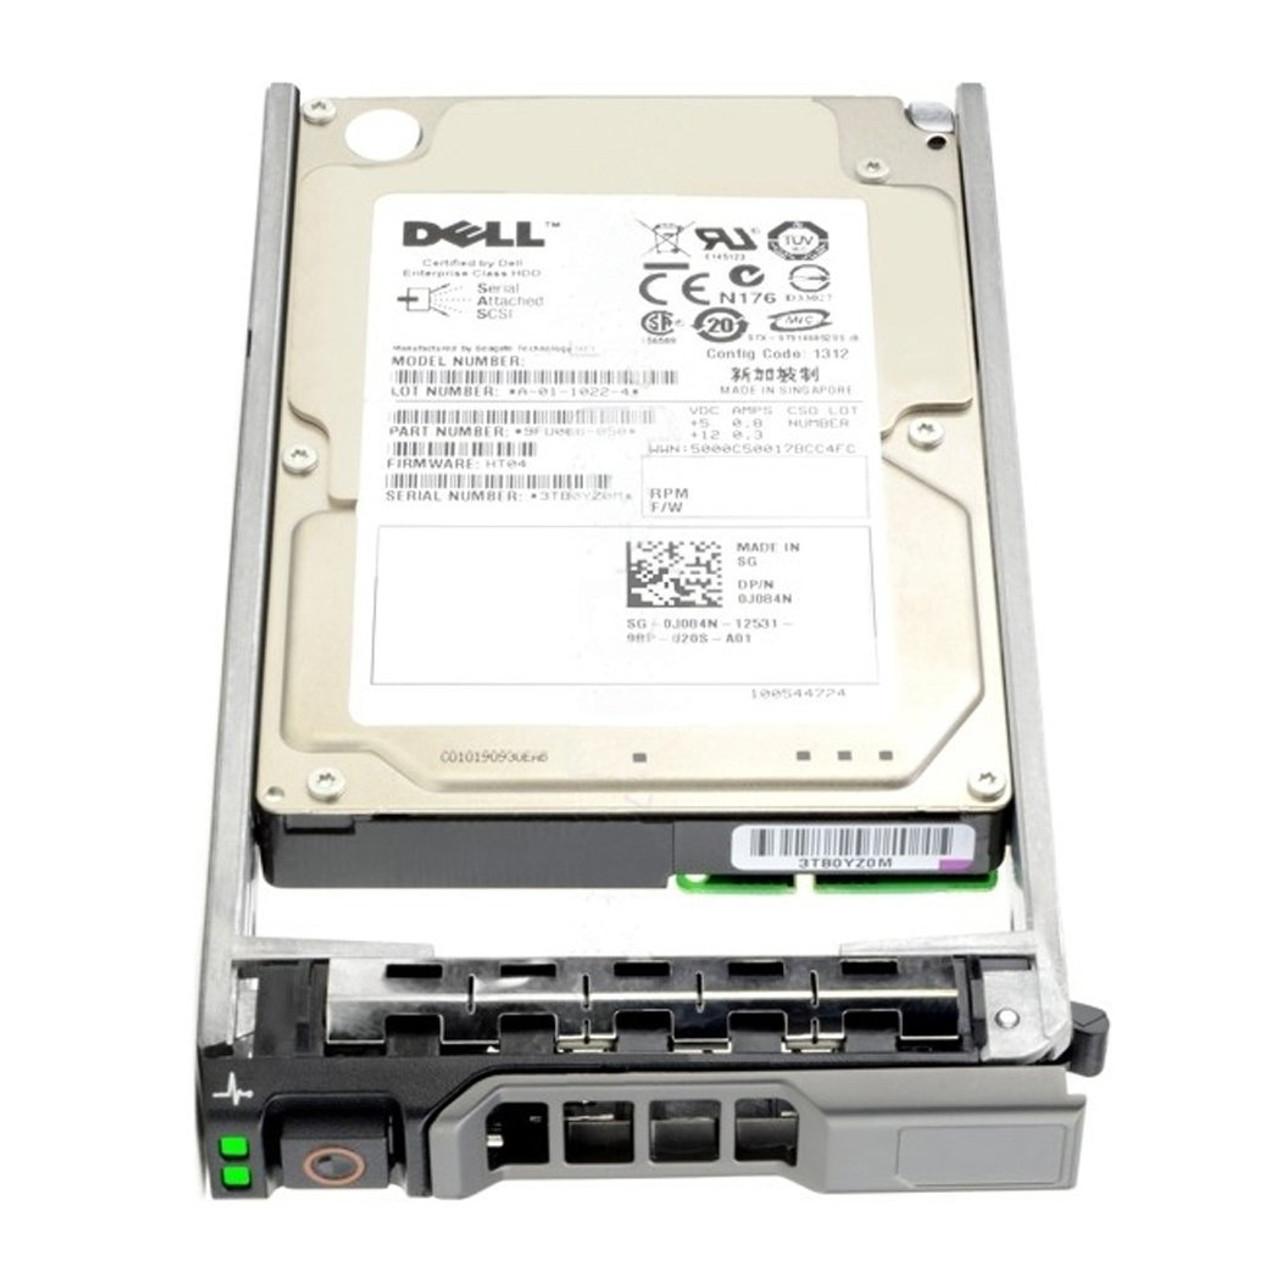 1 Year Warranty Dell PowerEdge R510 Hot Swap 600GB 15K 6Gb//s SAS Hard Drive